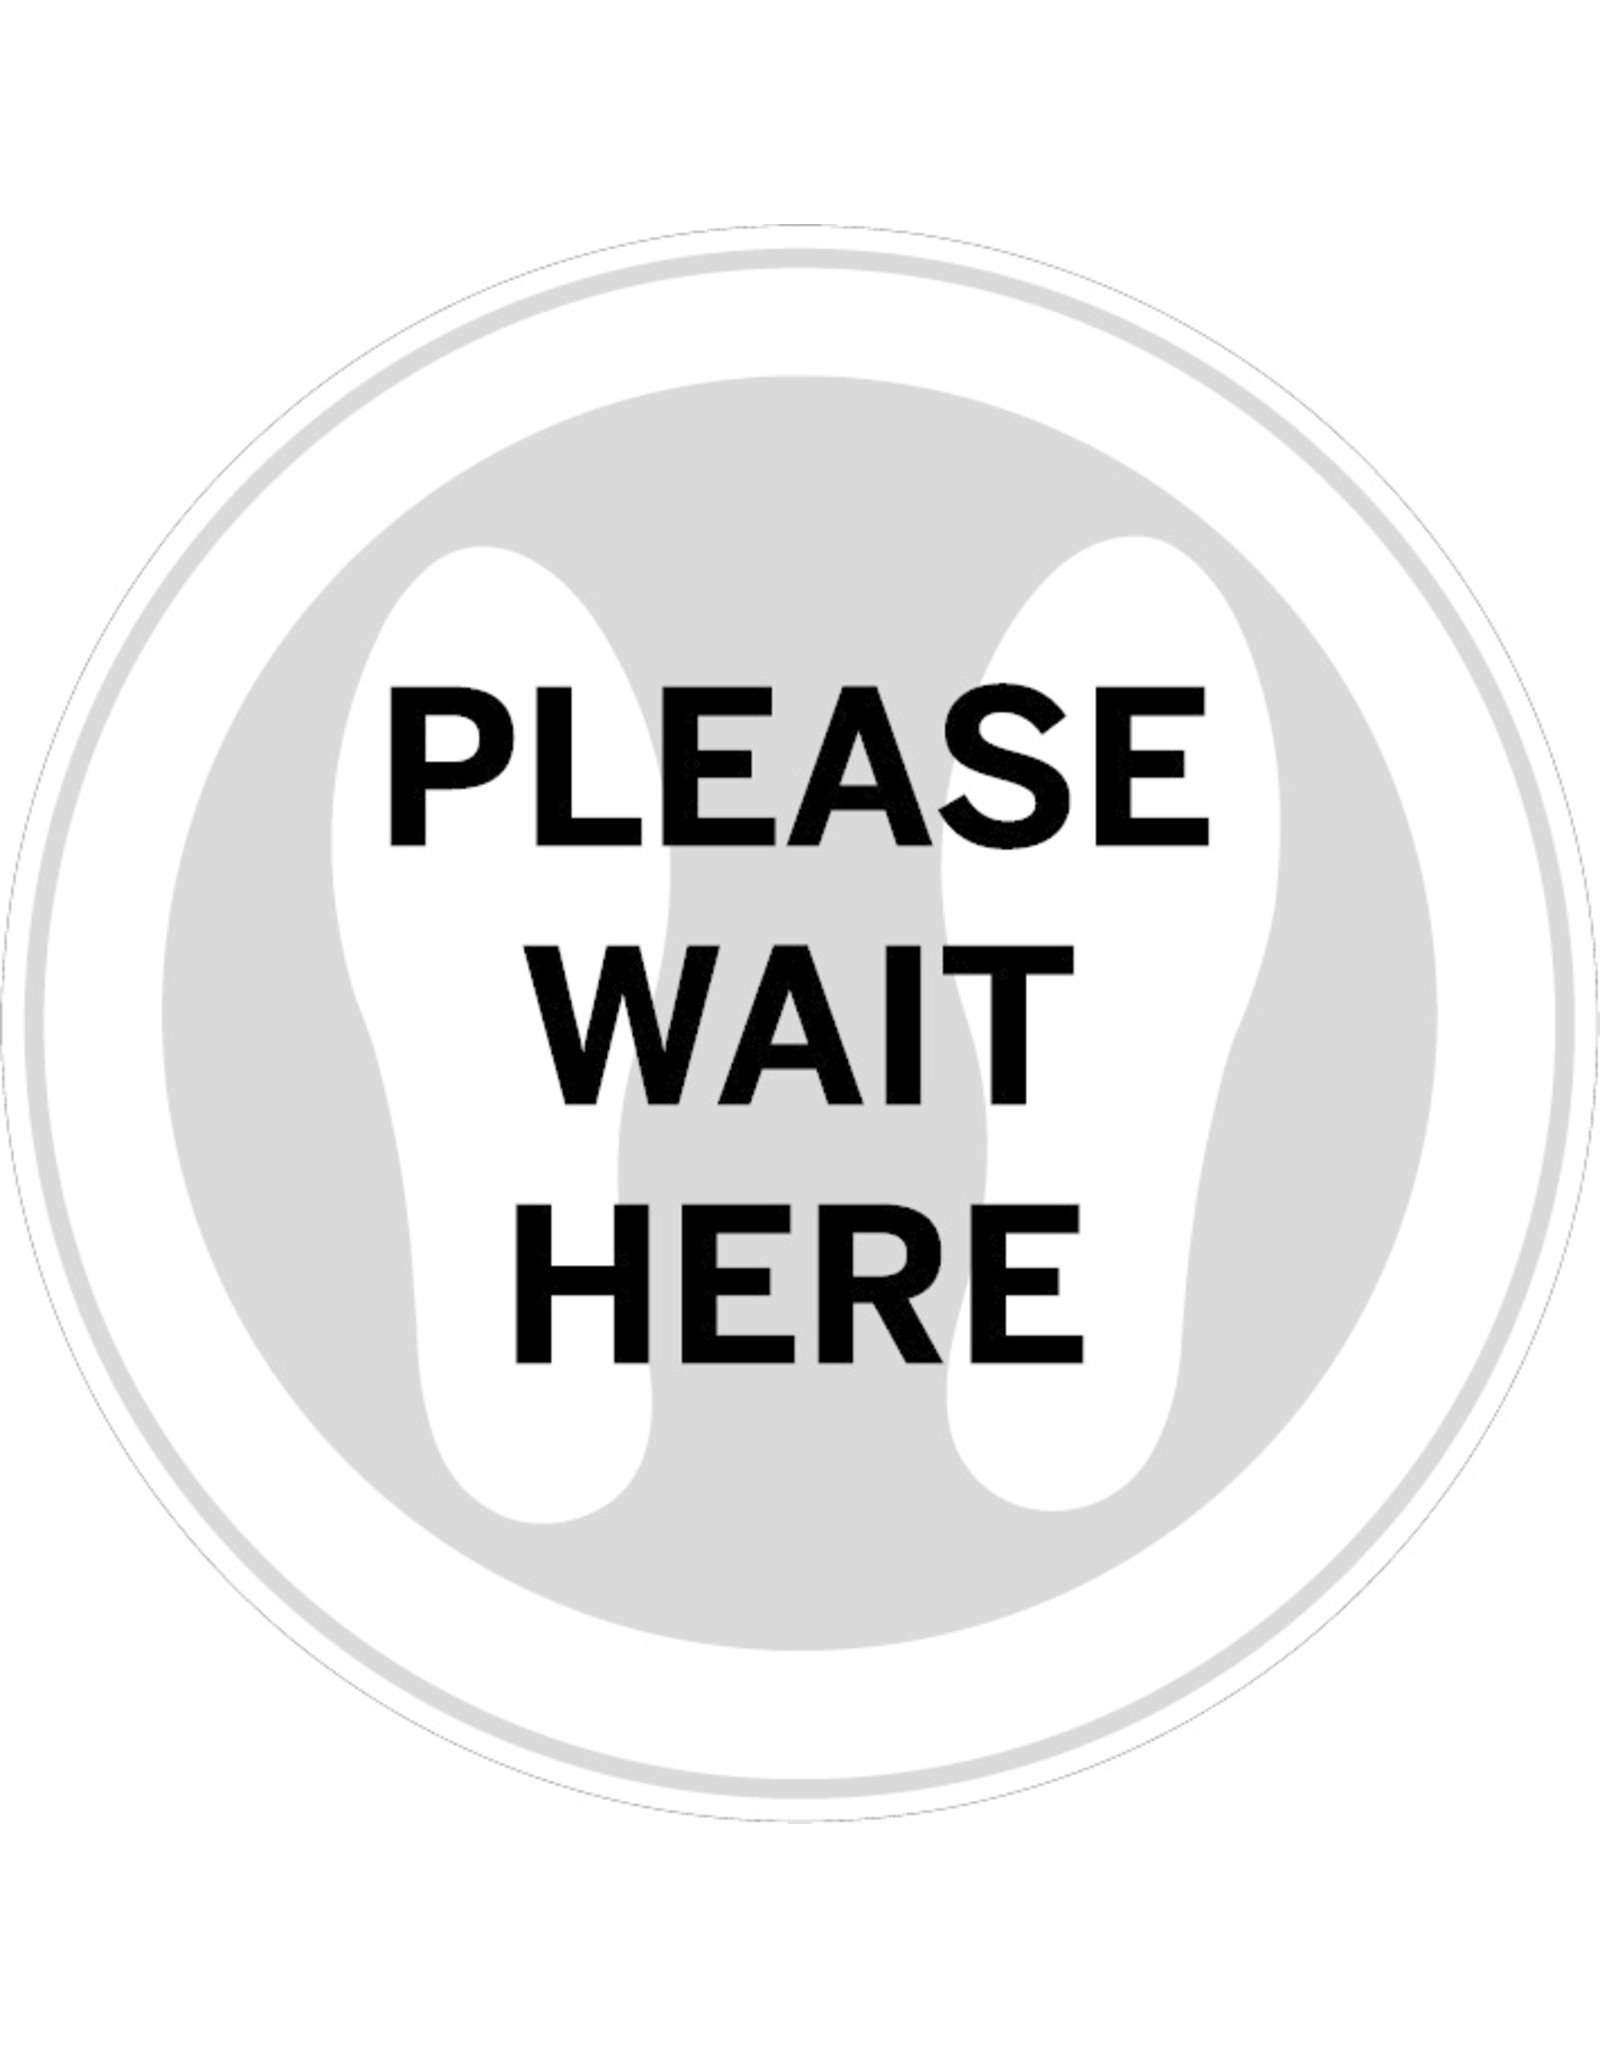 Sticker: please wait here